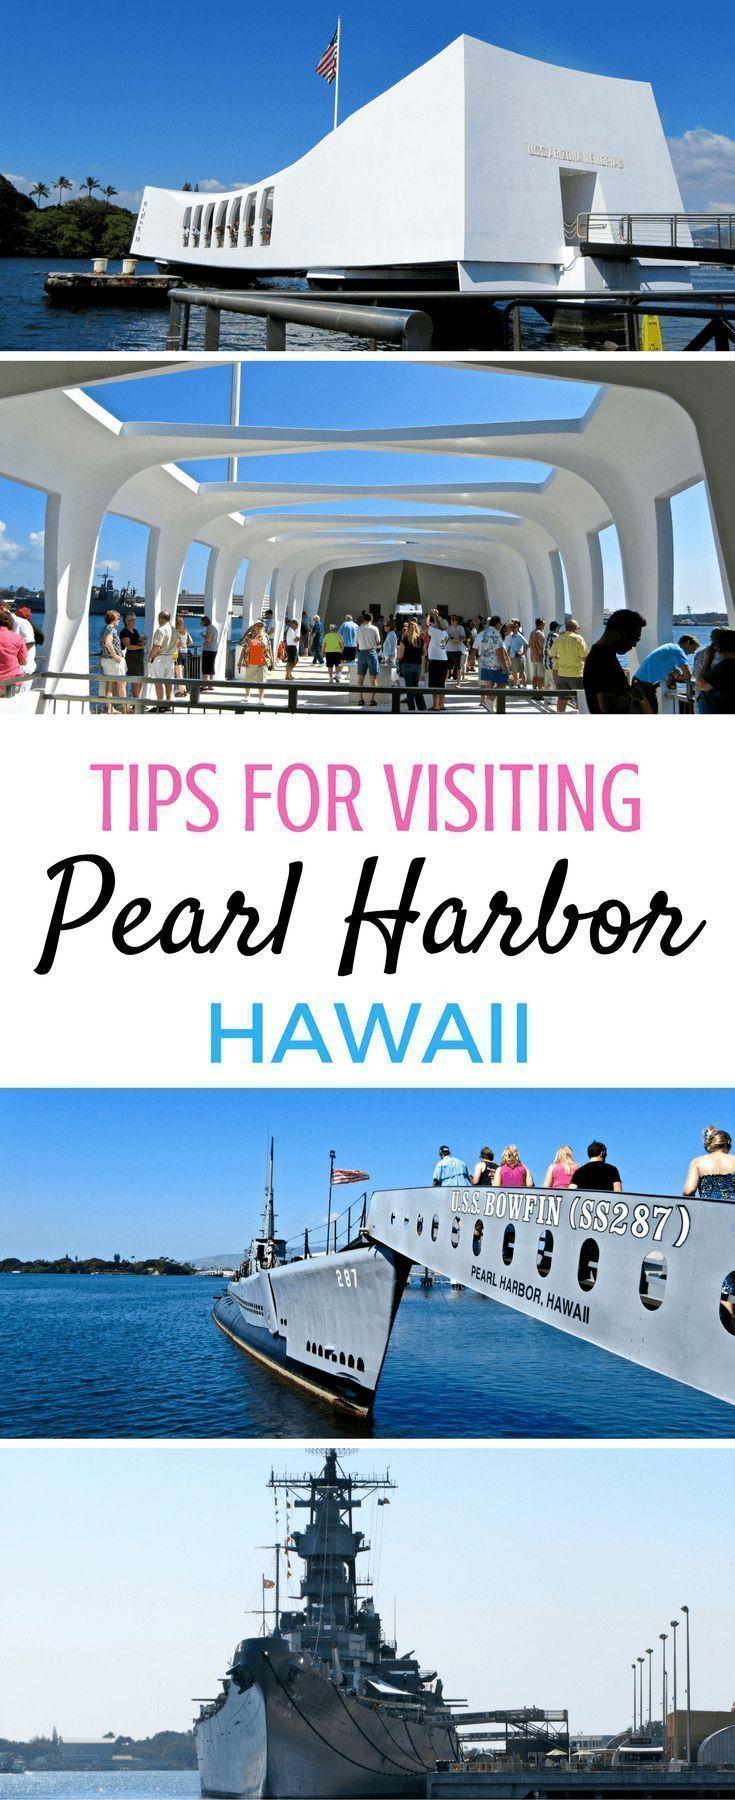 Tips for visiting Pearl Harbor in Hawaii | #PearlHarbor #Oahu #Hawaii #travel